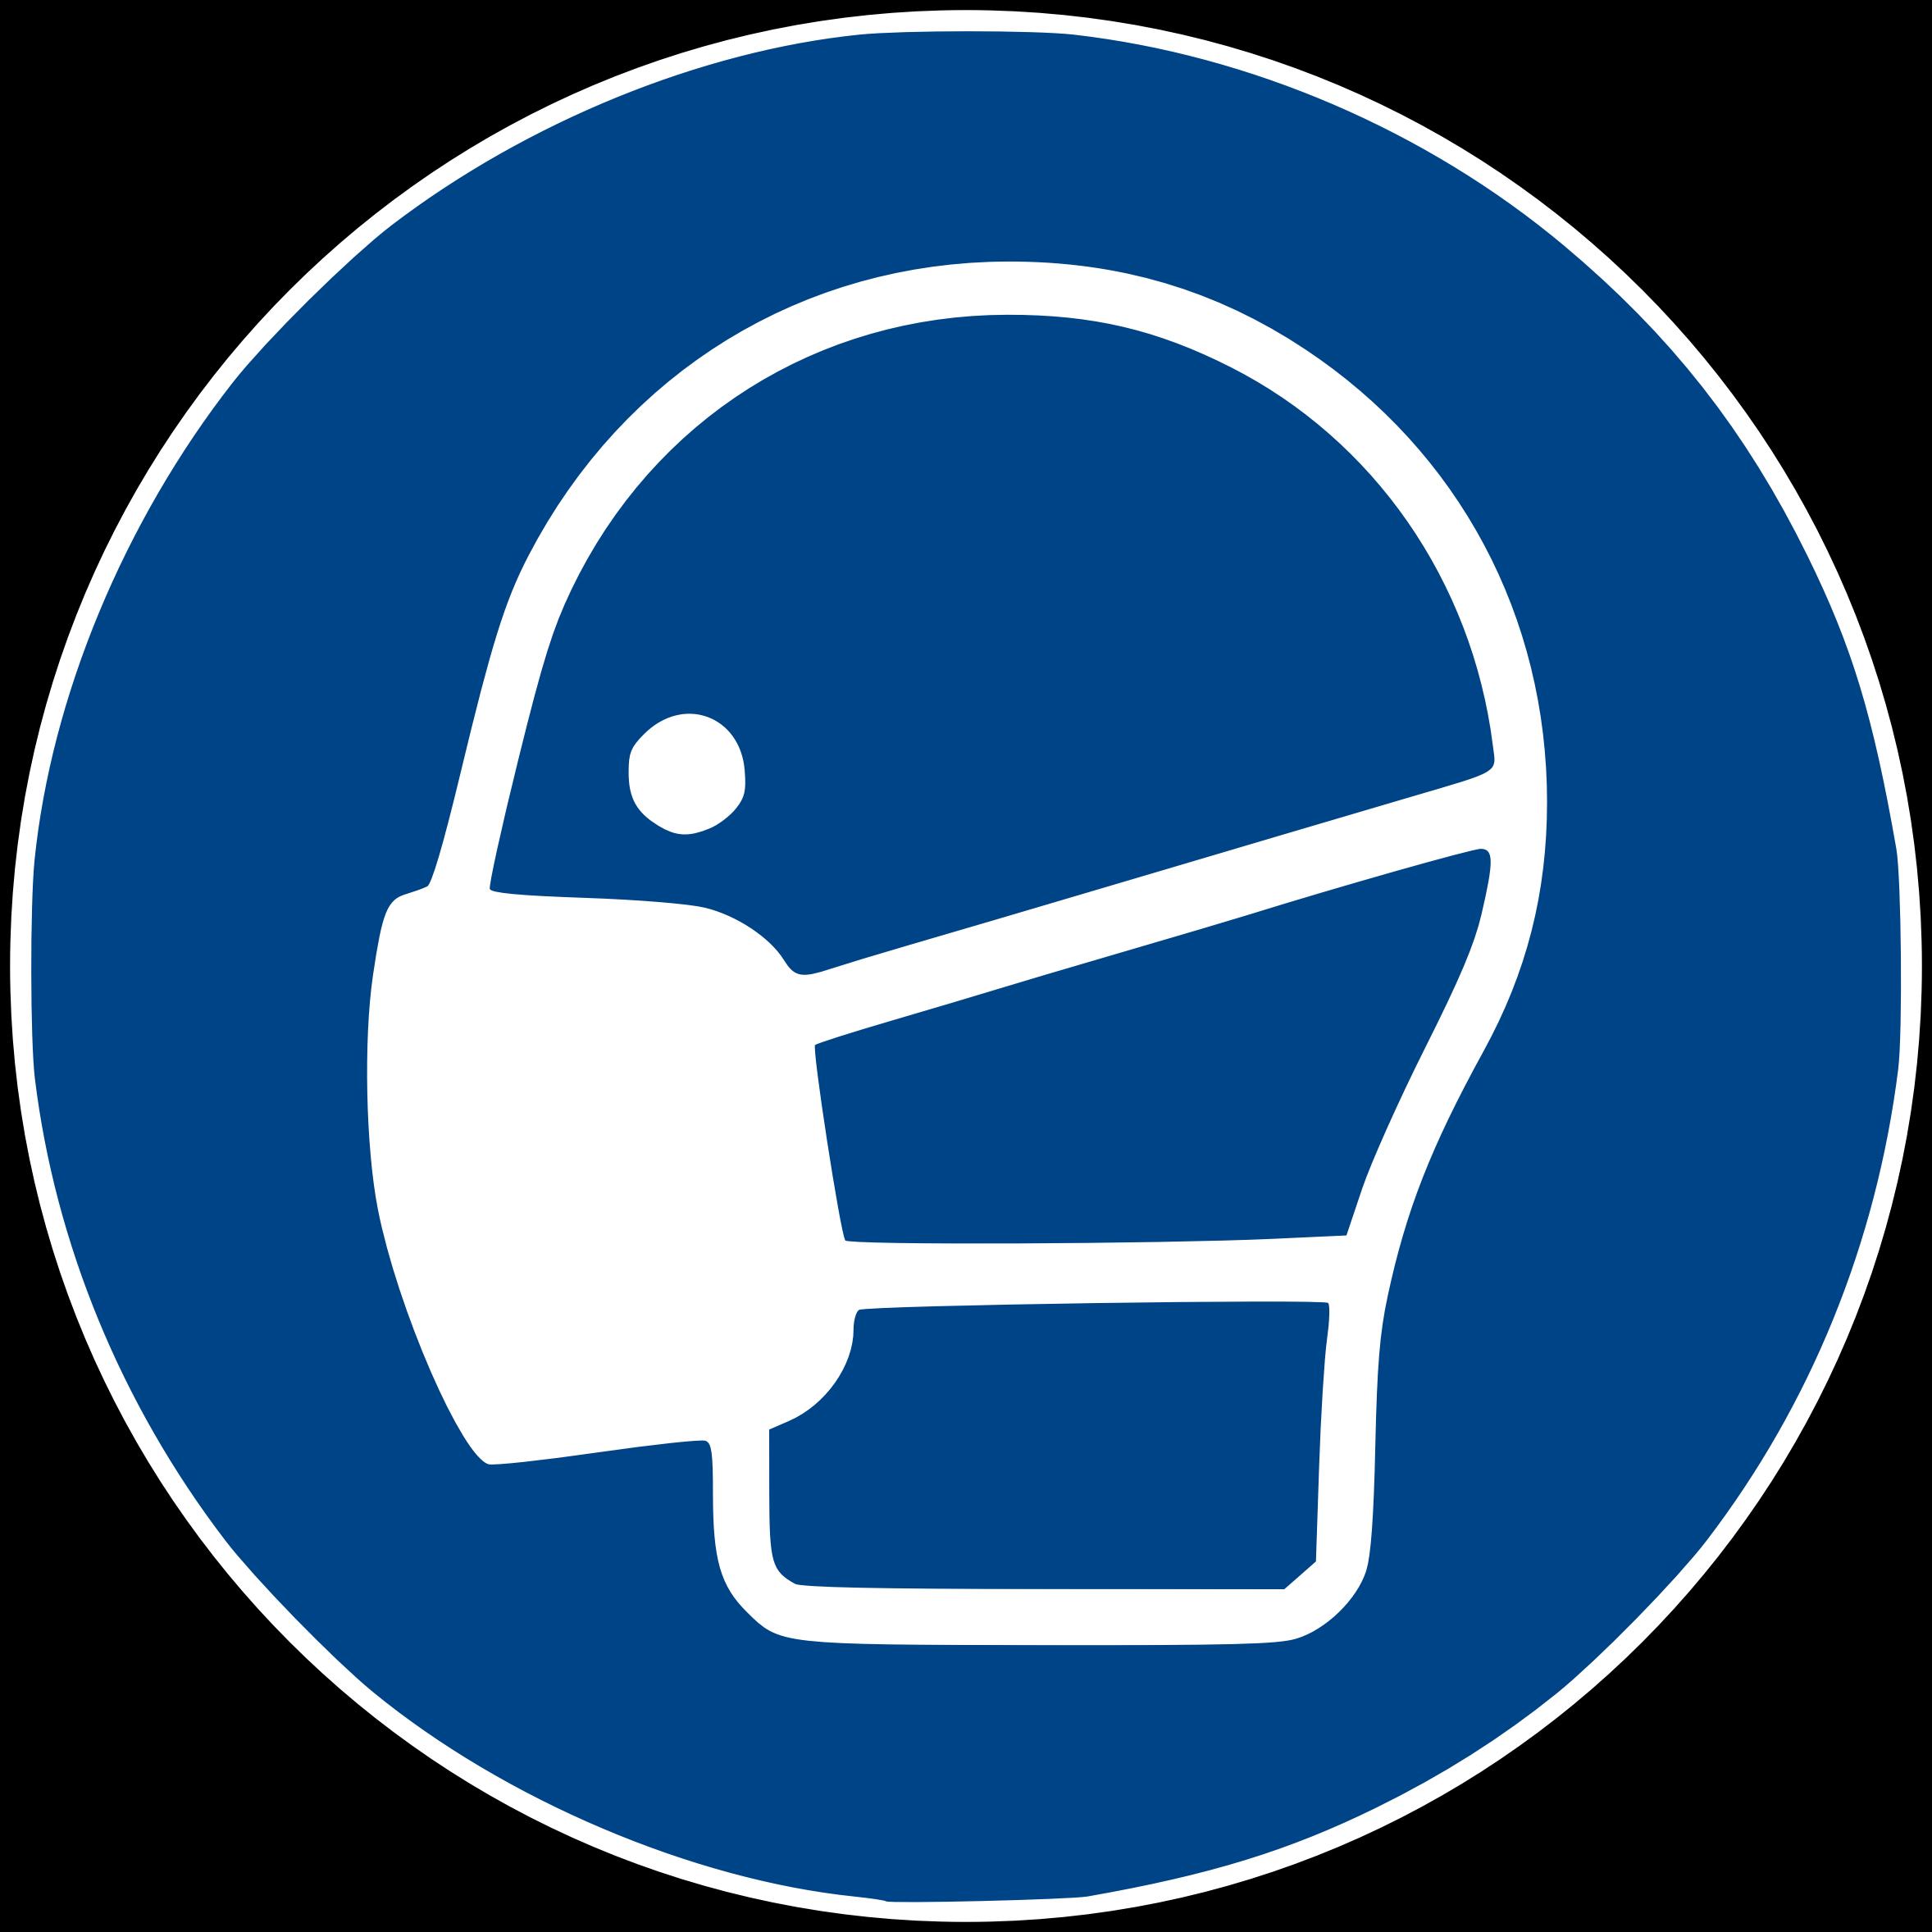 Face mask big image. Football facemask clipart